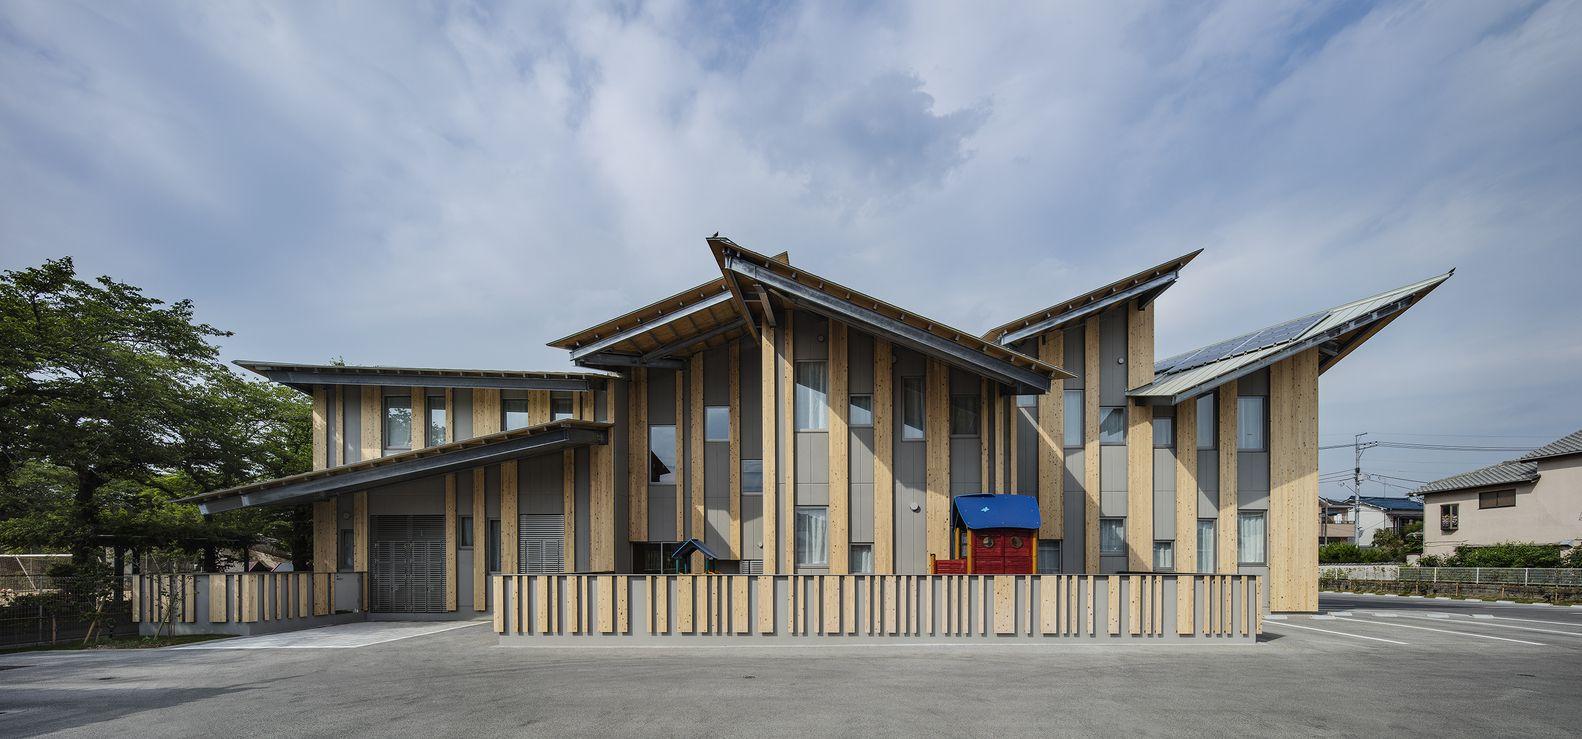 Aitoku Kindergarten C Katsumasa Tanaka Roof Design Roof Architecture Kengo Kuma